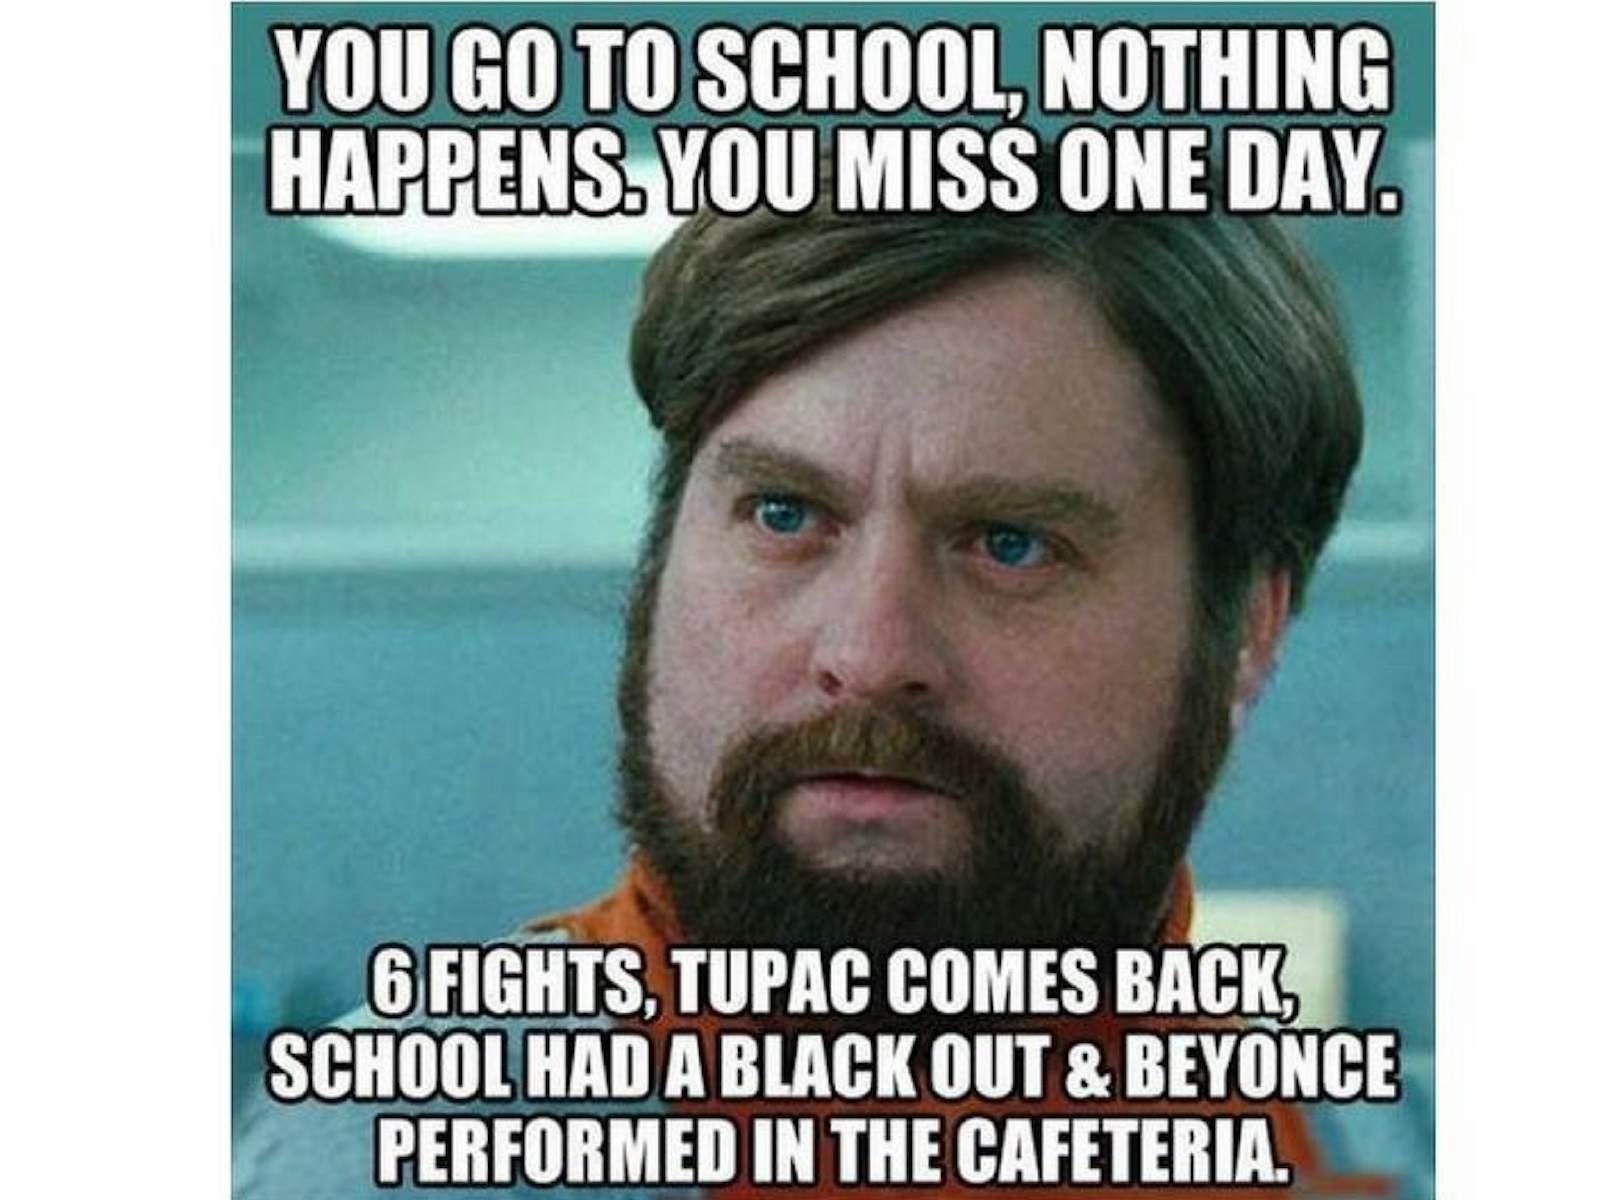 School meme